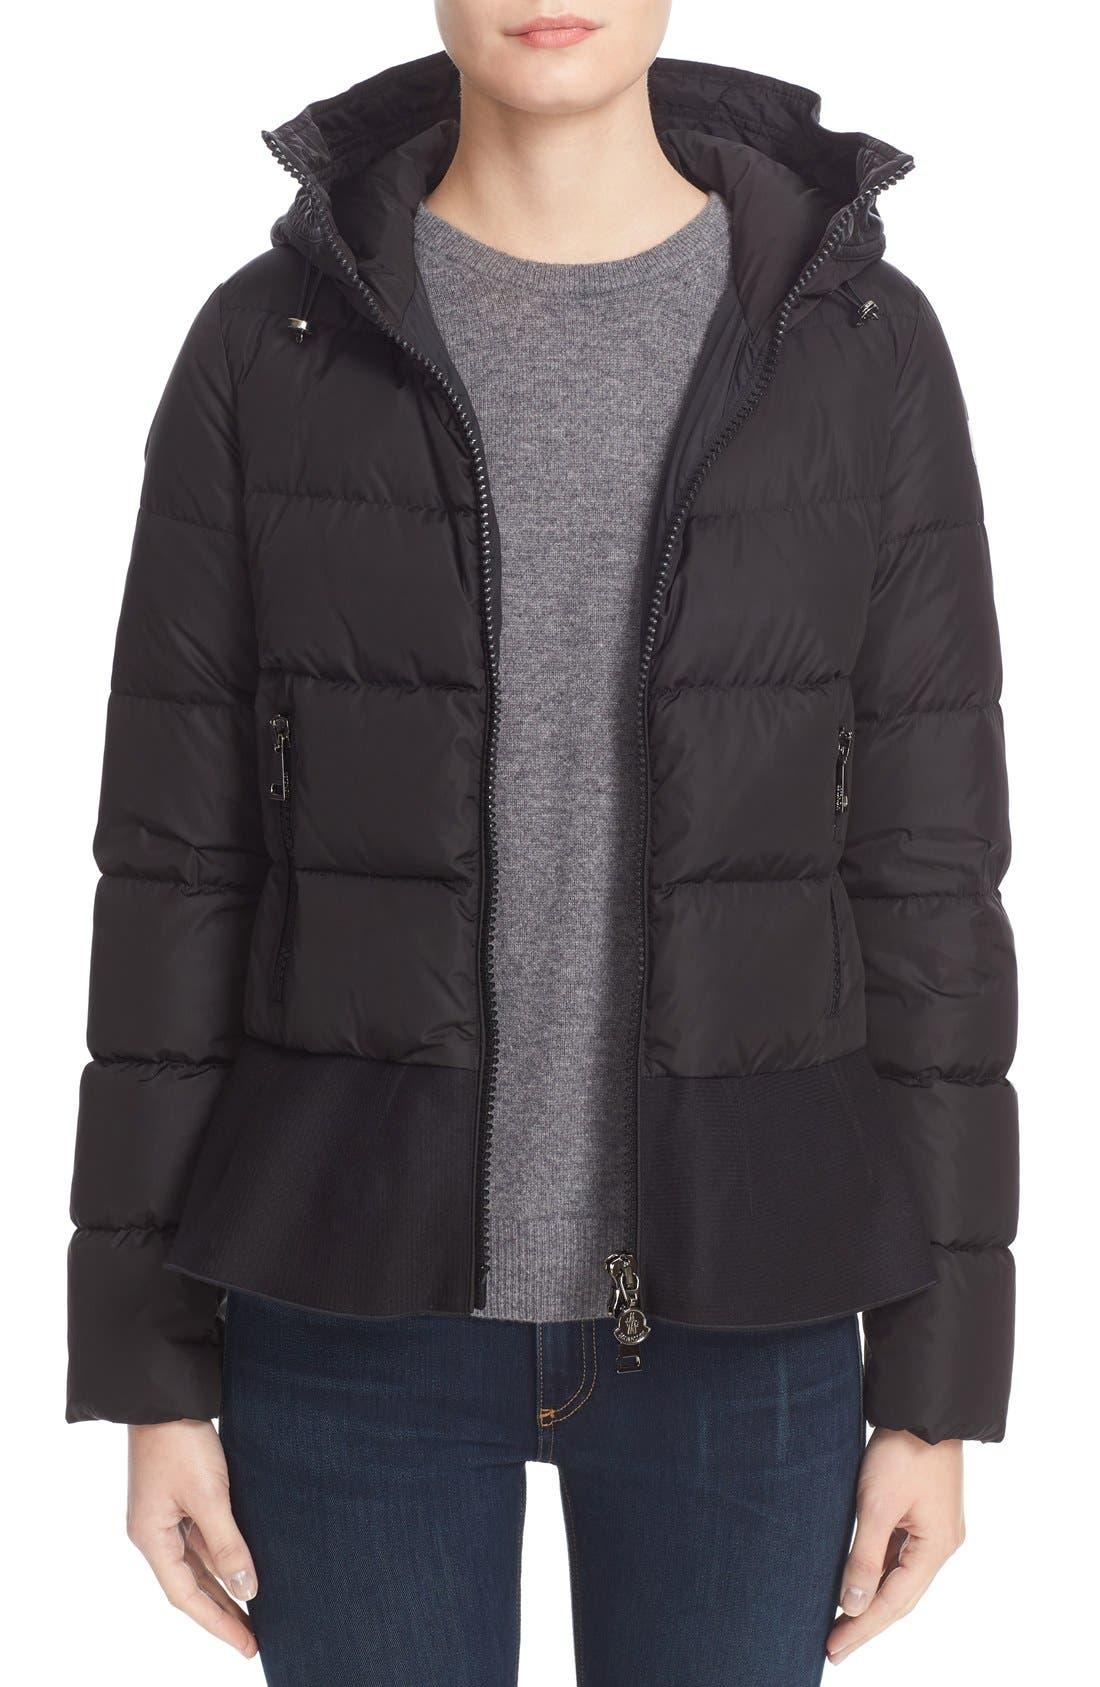 Alternate Image 1 Selected - Moncler Nesea Peplum Hem Down Puffer Jacket